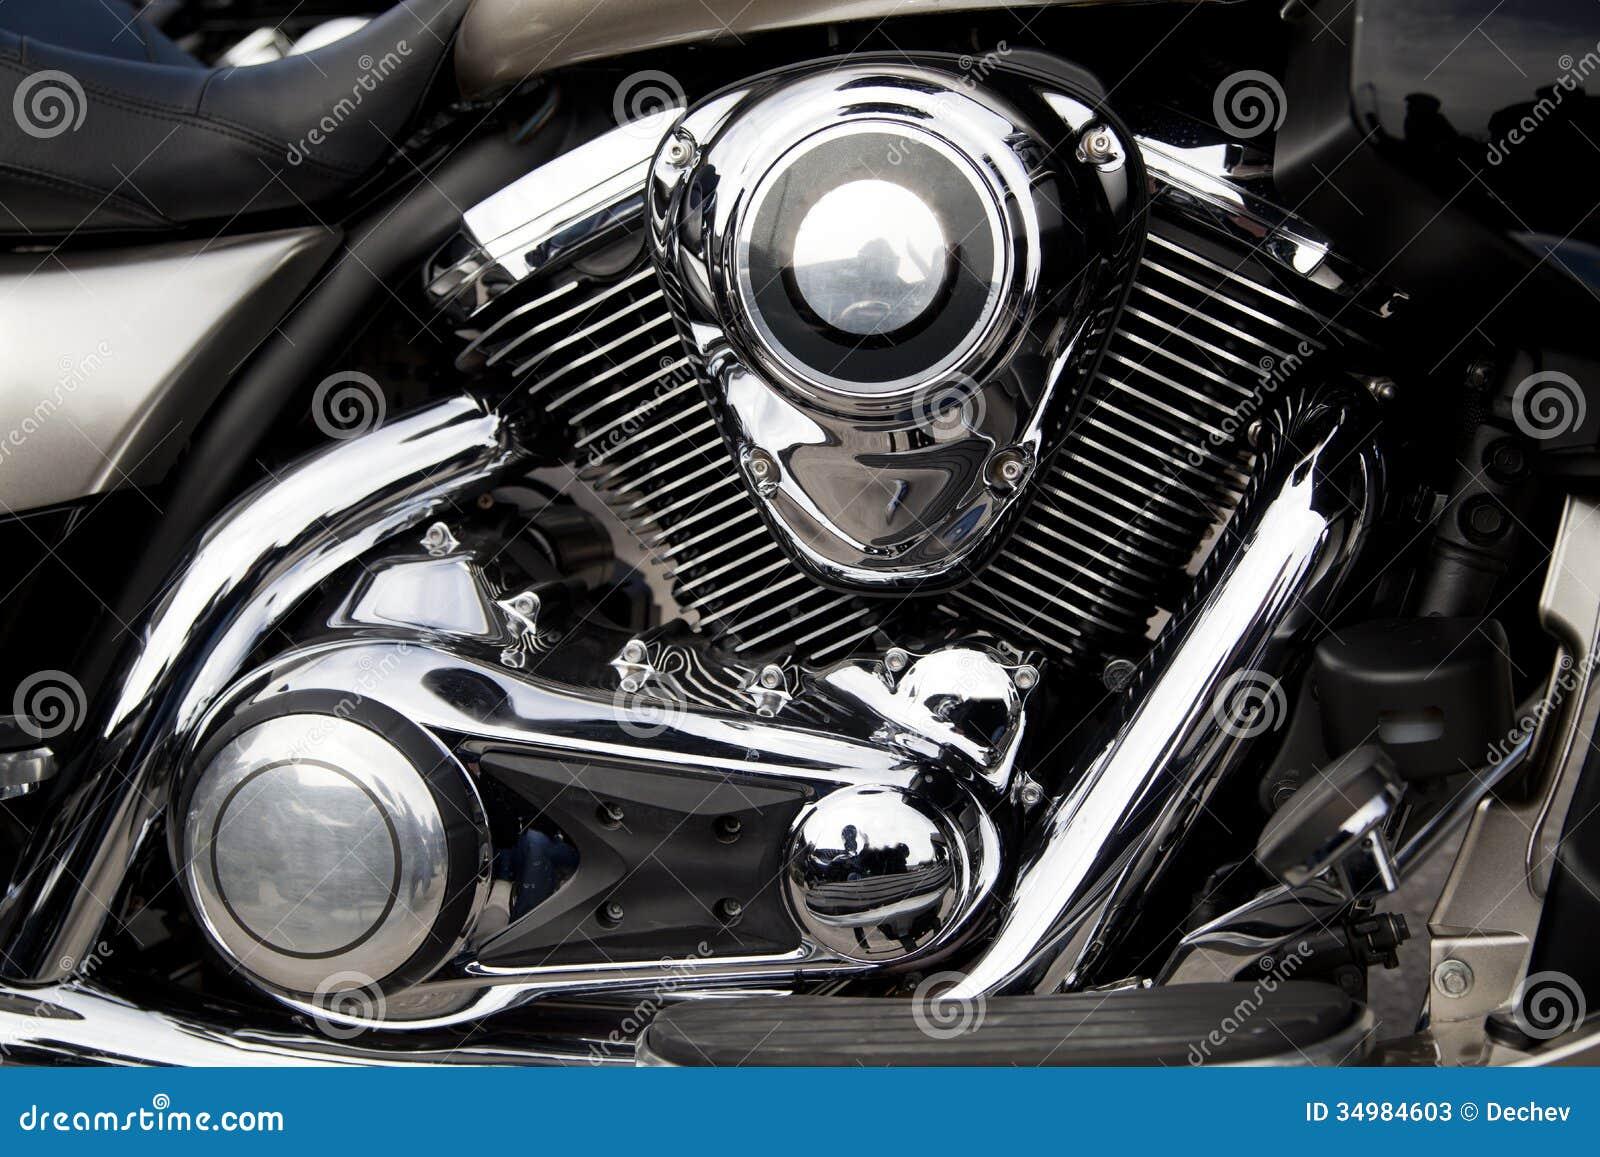 Motorcycle Engine Motor Stock Photos Image 34984603